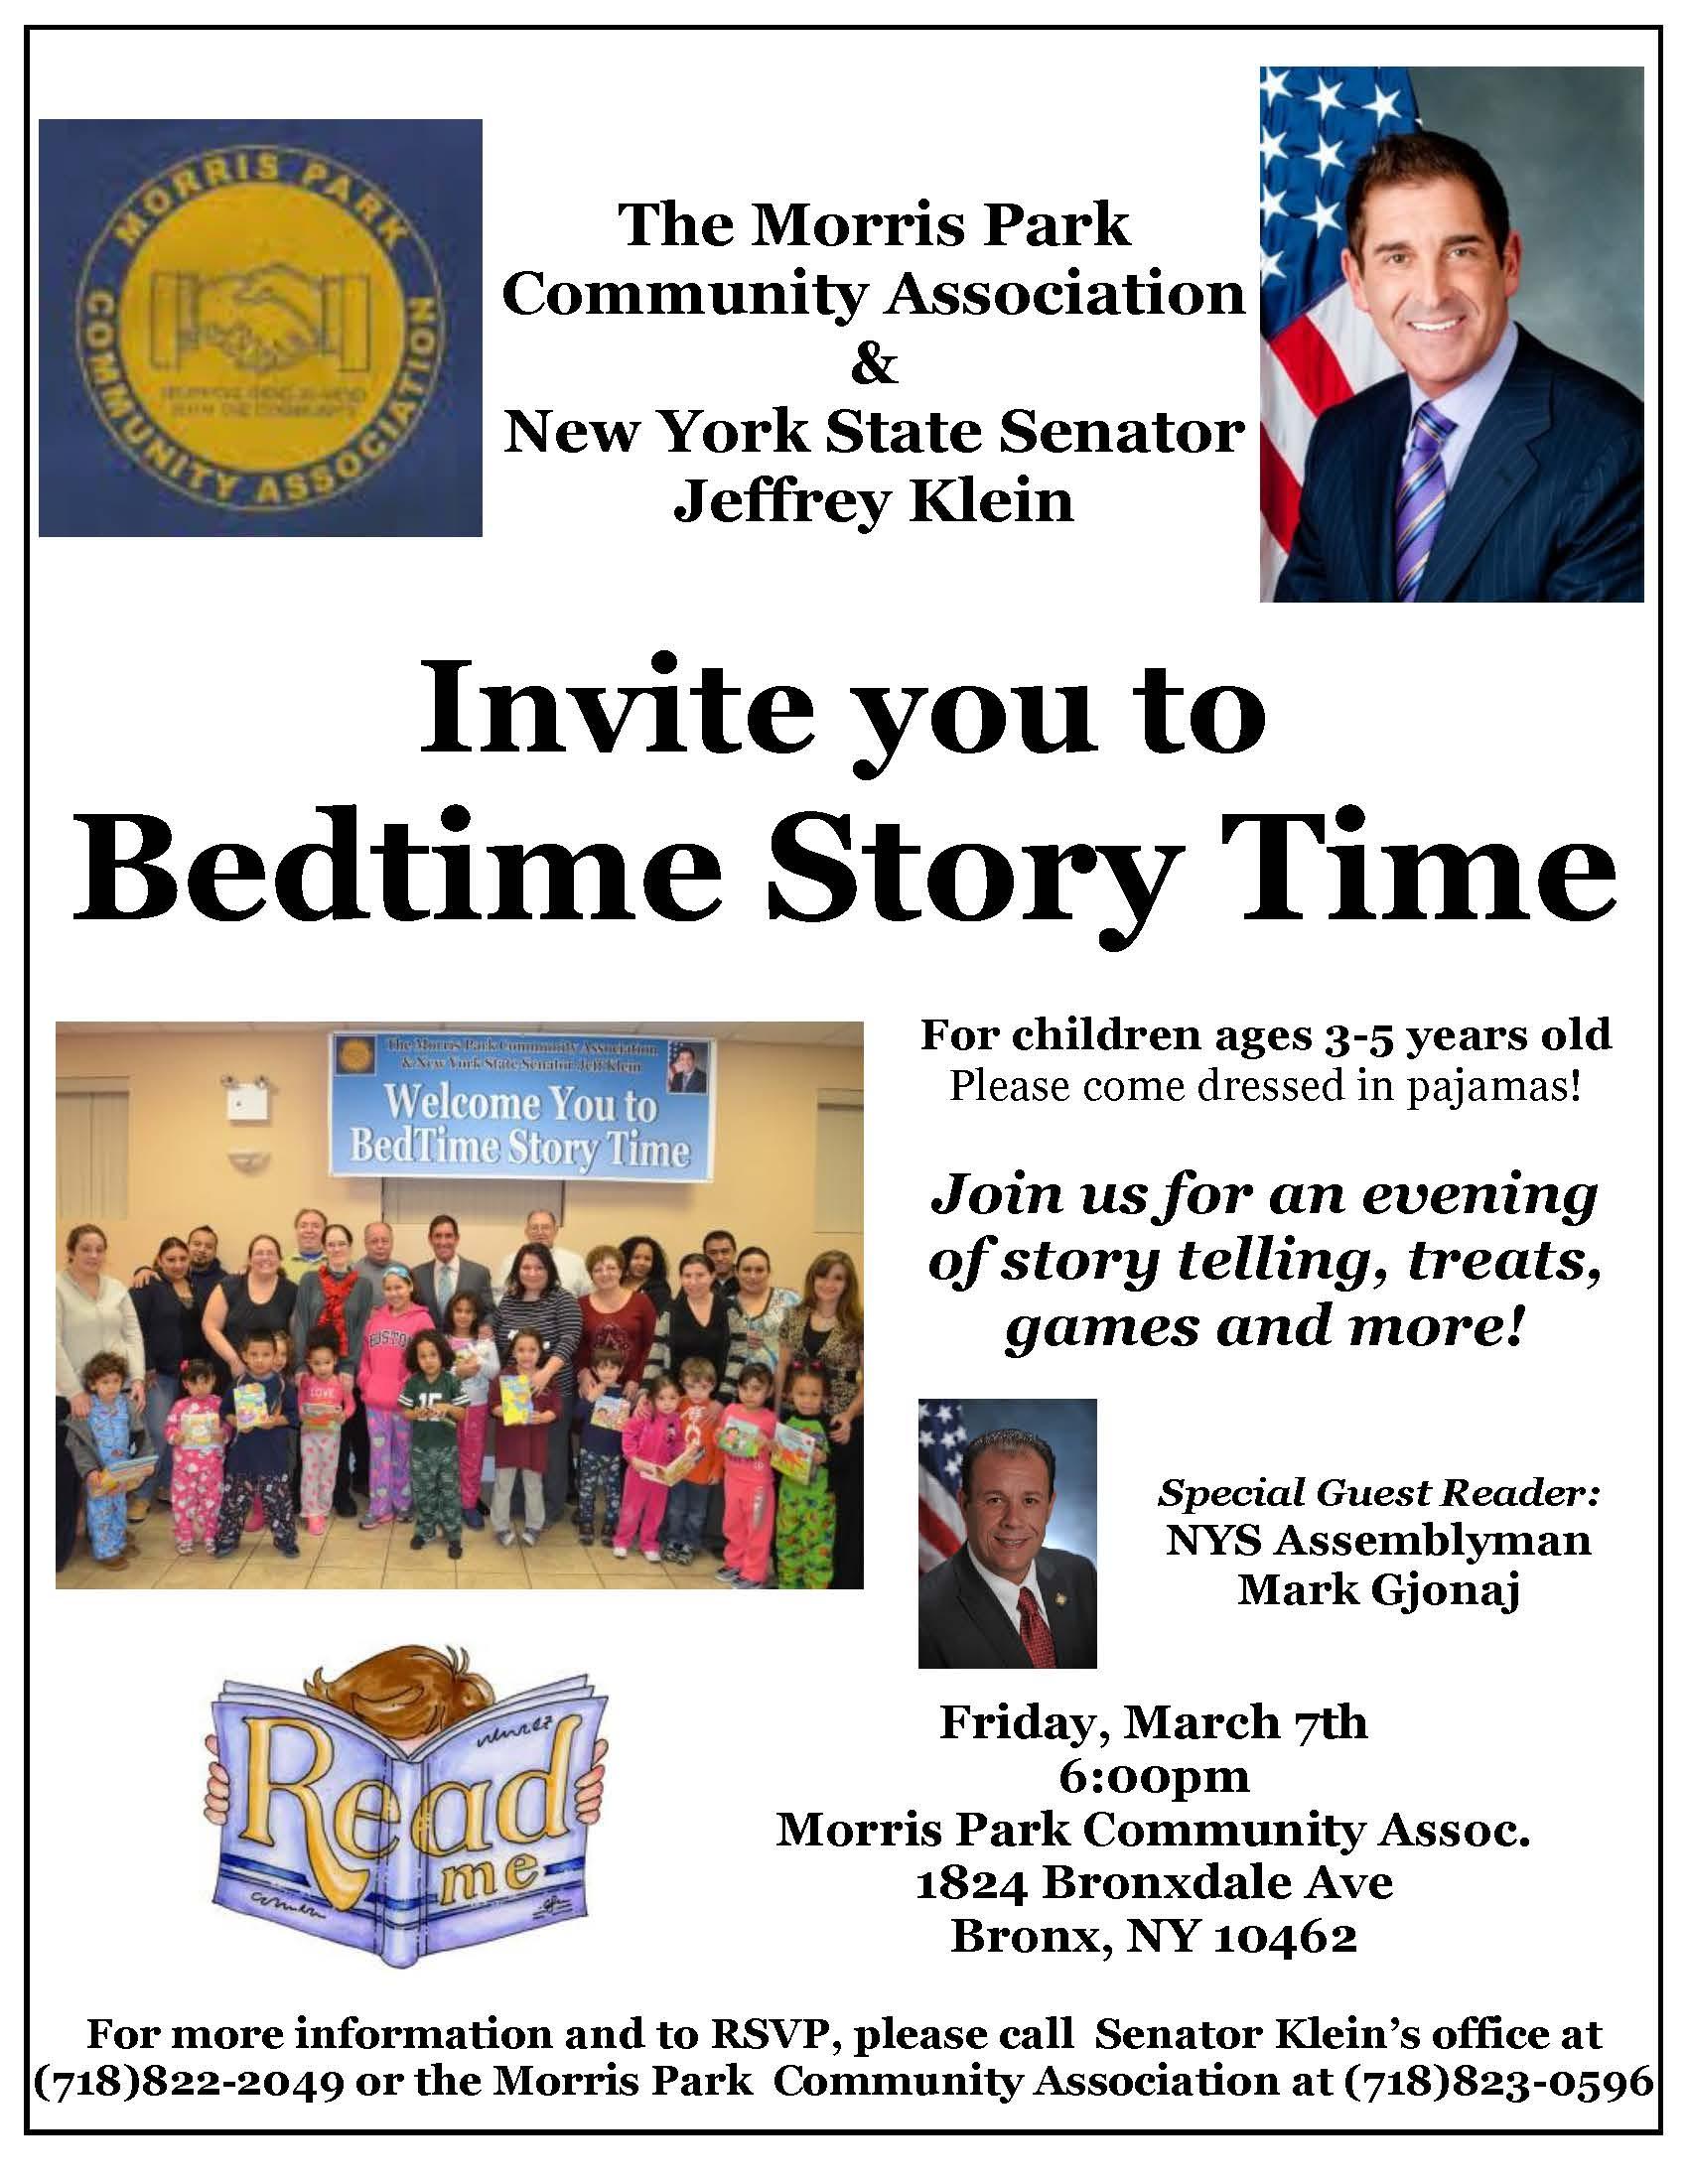 Bedtime Story Time – Friday, March 7th with reader Assemblyman Mark Gjonaj